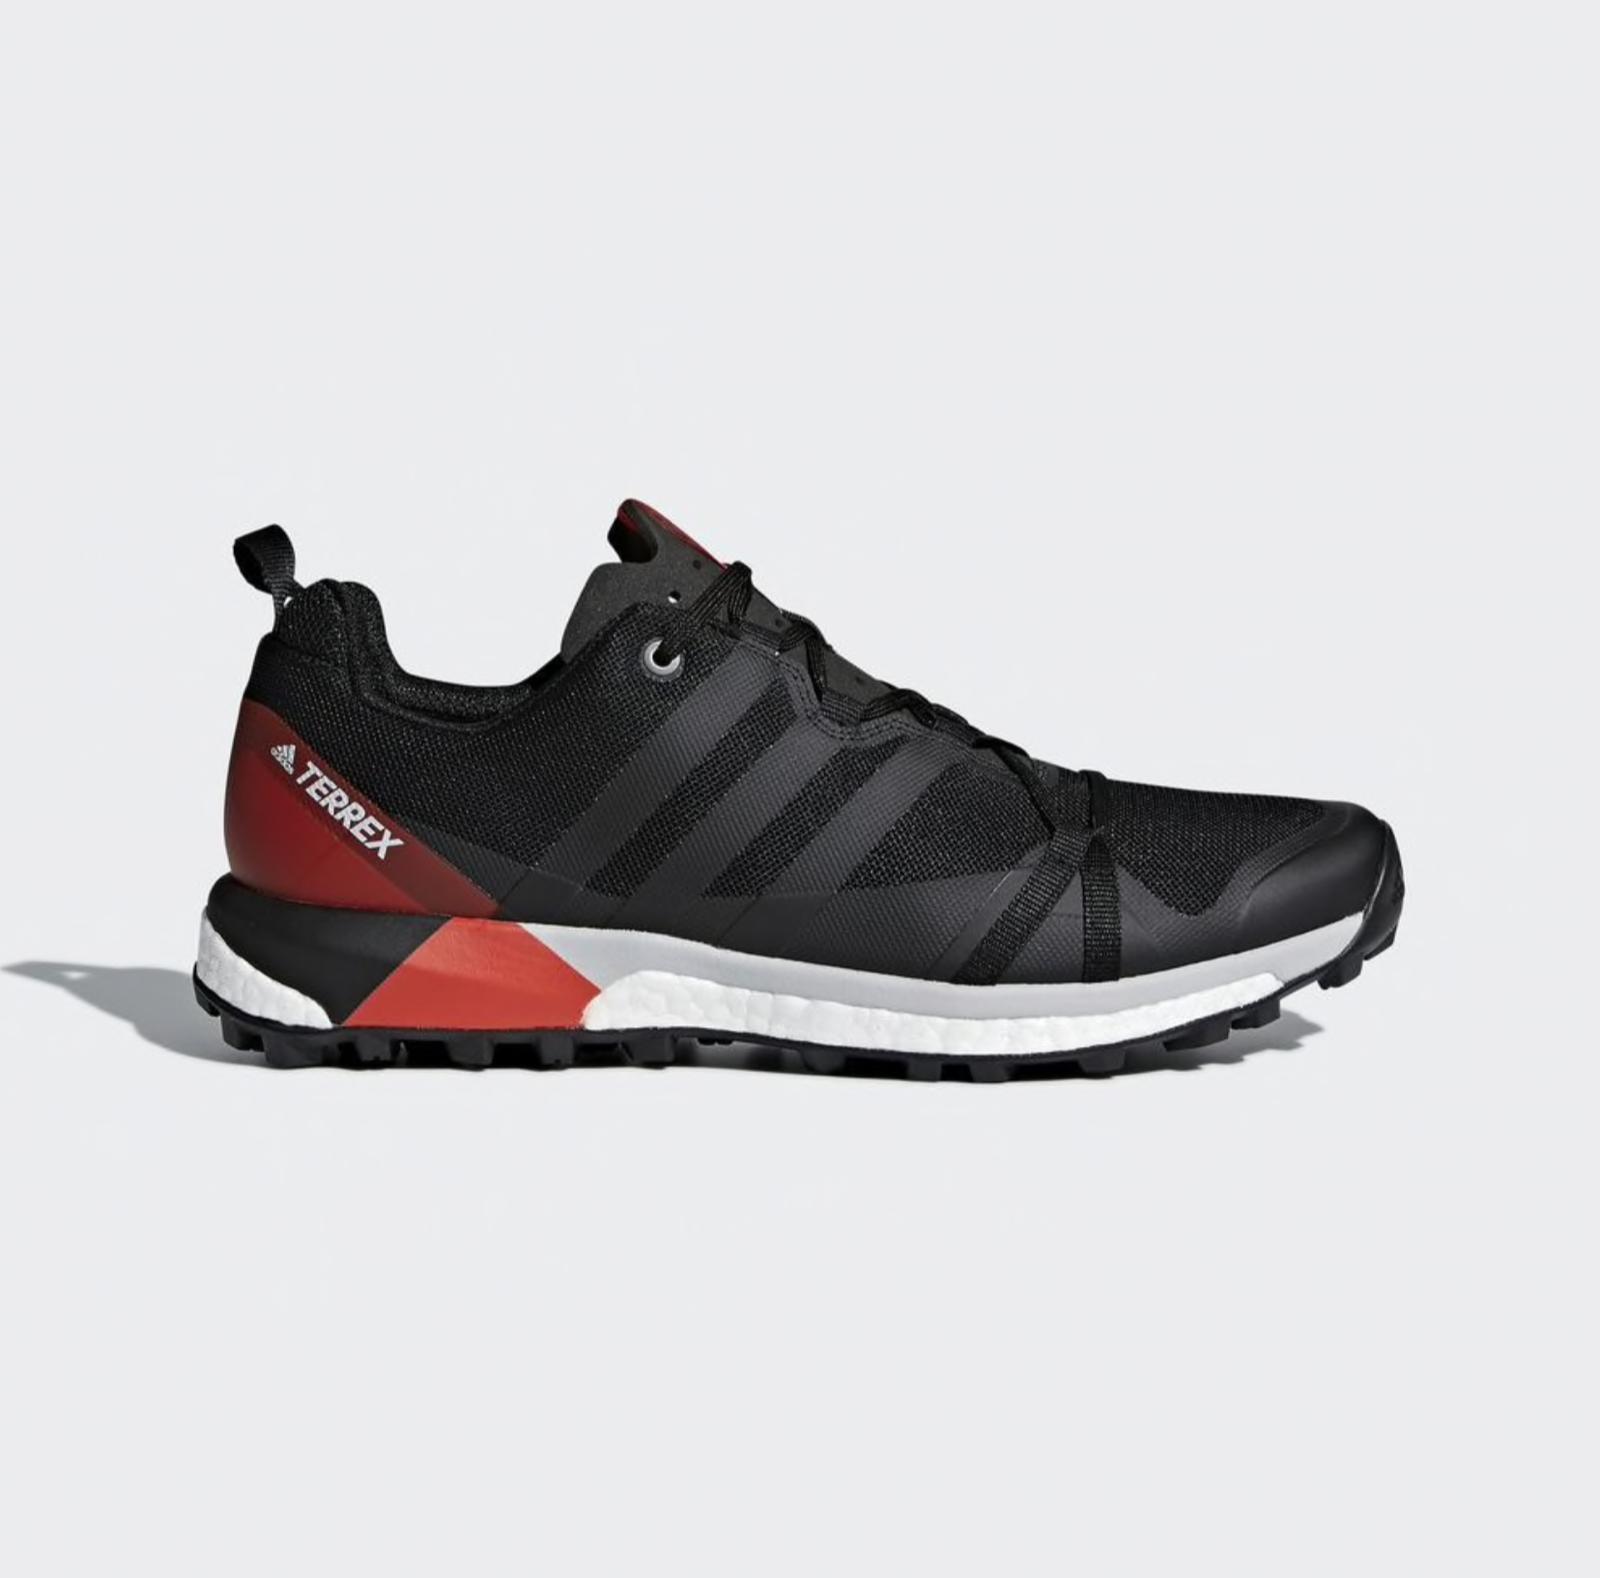 Adidas Adidas Adidas Men's Terrex Agravic CM7615 in Black Carbon Hi-Res Red Sz. 11, 11.5 NEW  1fb4e0